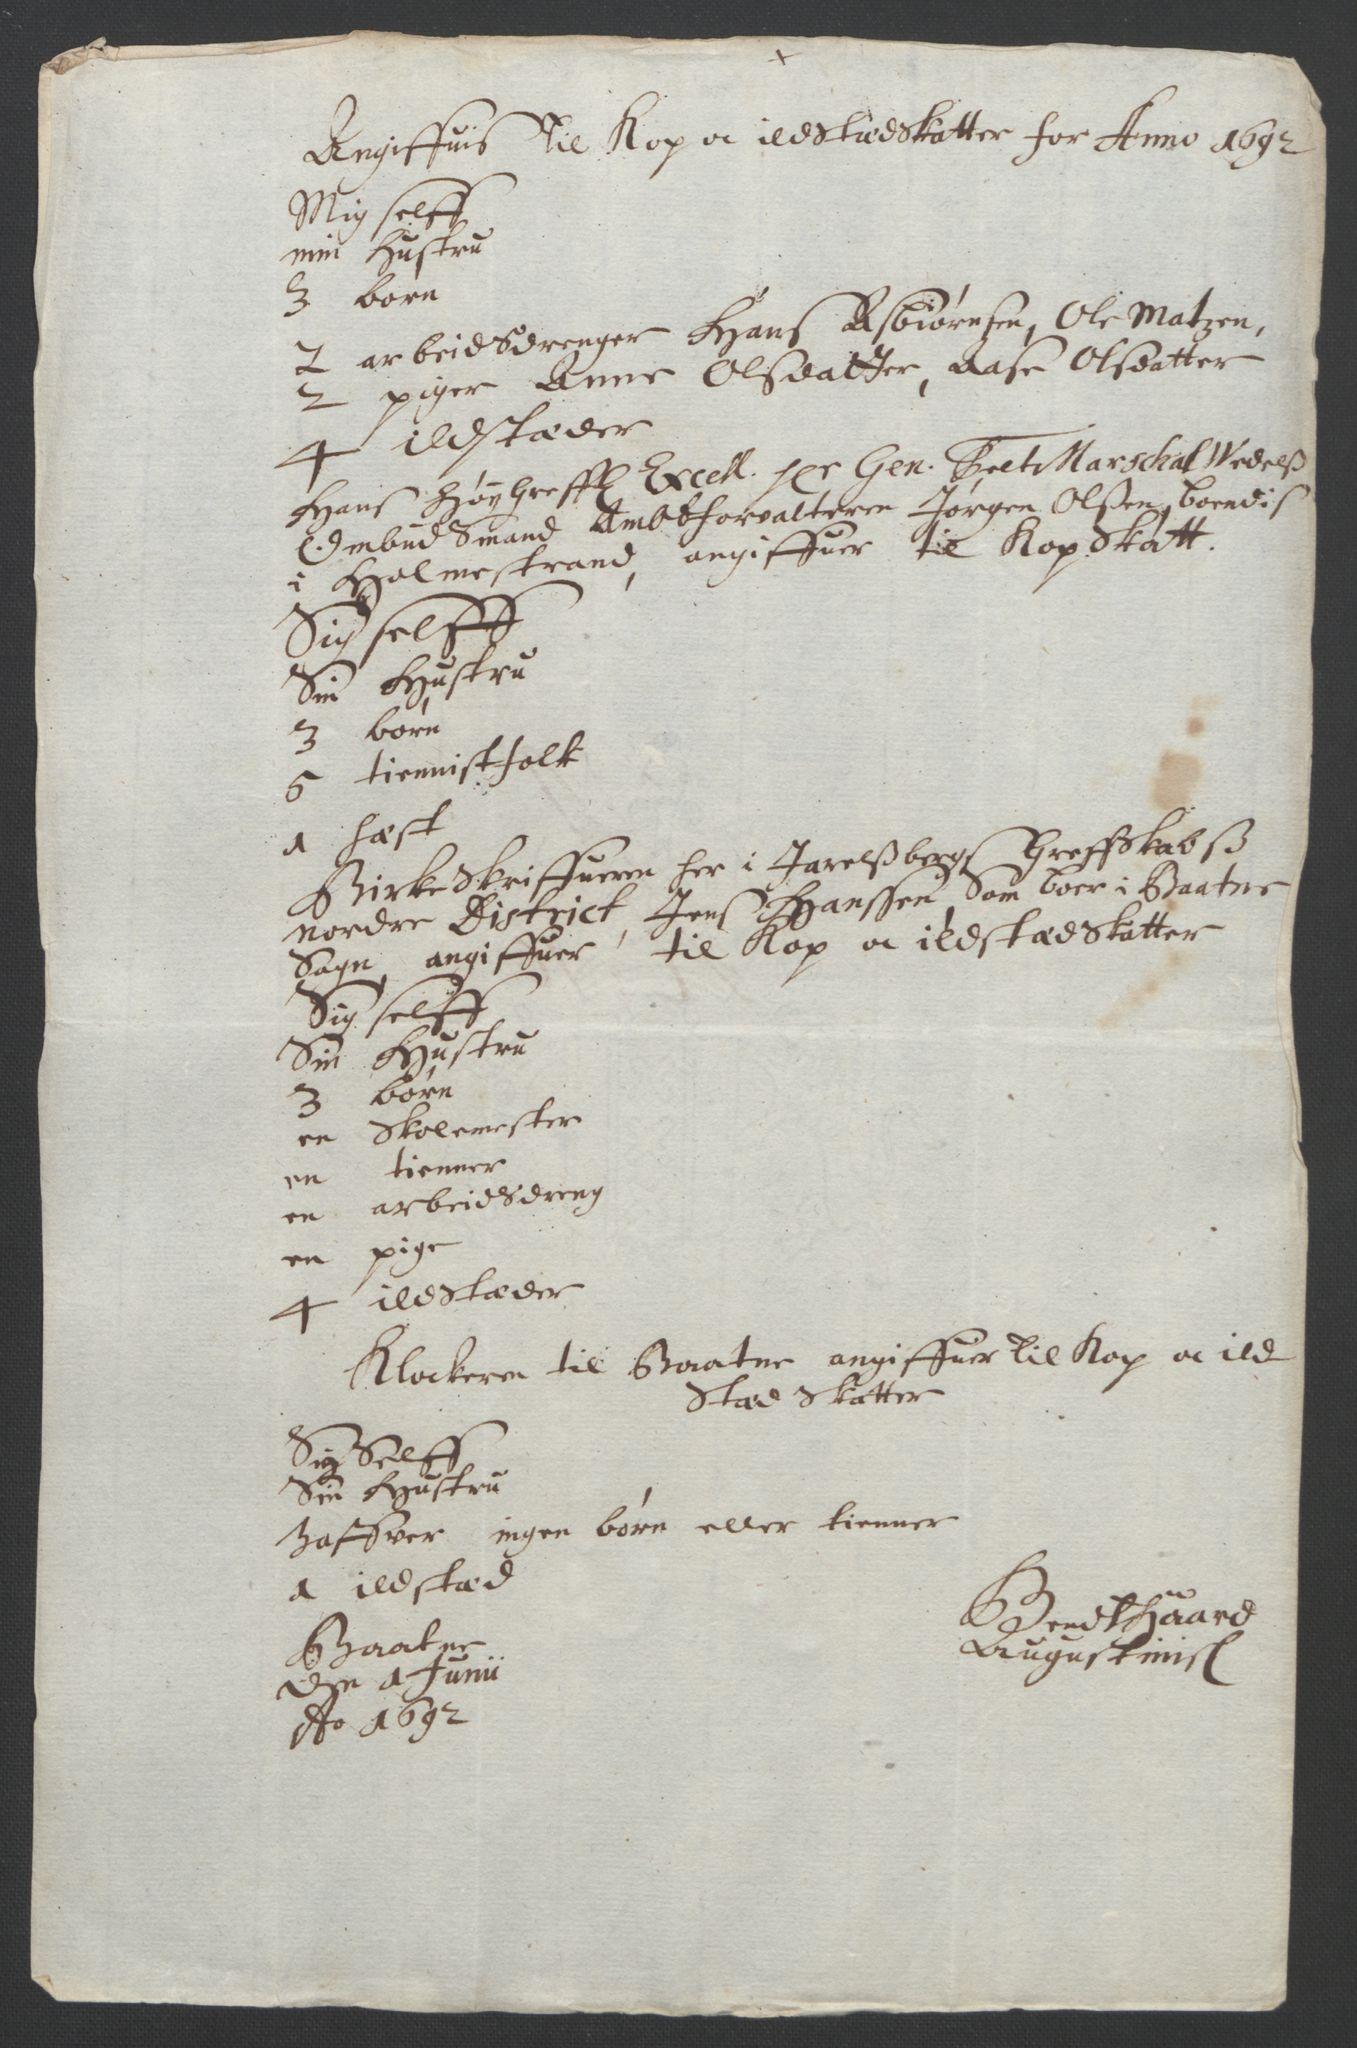 RA, Rentekammeret inntil 1814, Reviderte regnskaper, Fogderegnskap, R32/L1865: Fogderegnskap Jarlsberg grevskap, 1692, s. 291